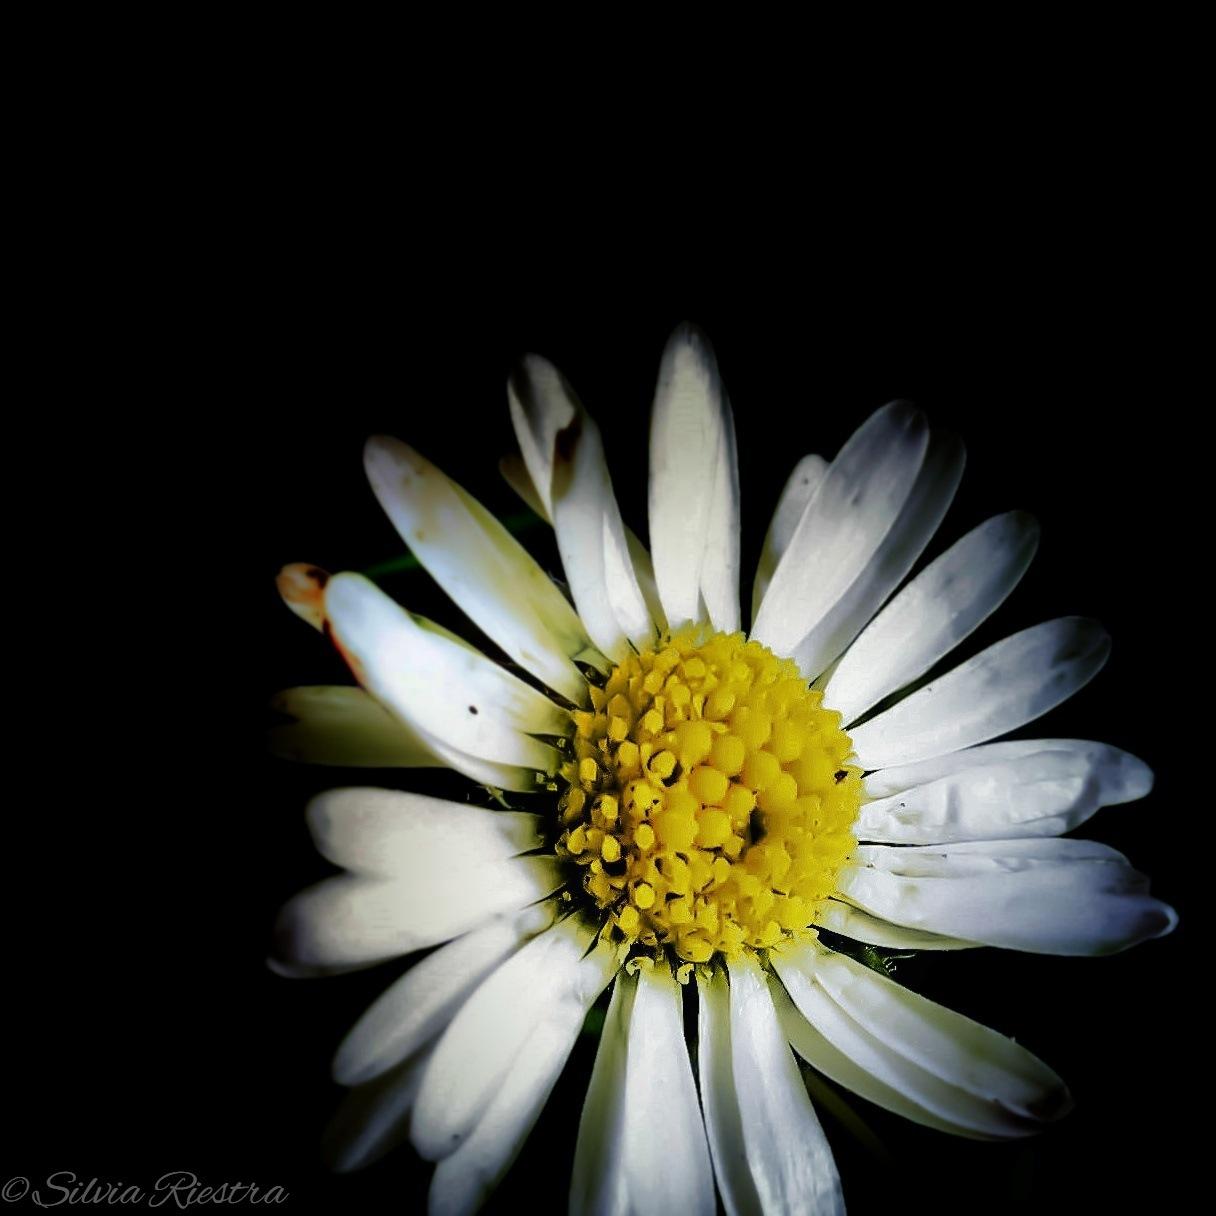 Light in the Dark by Silvia Riestra